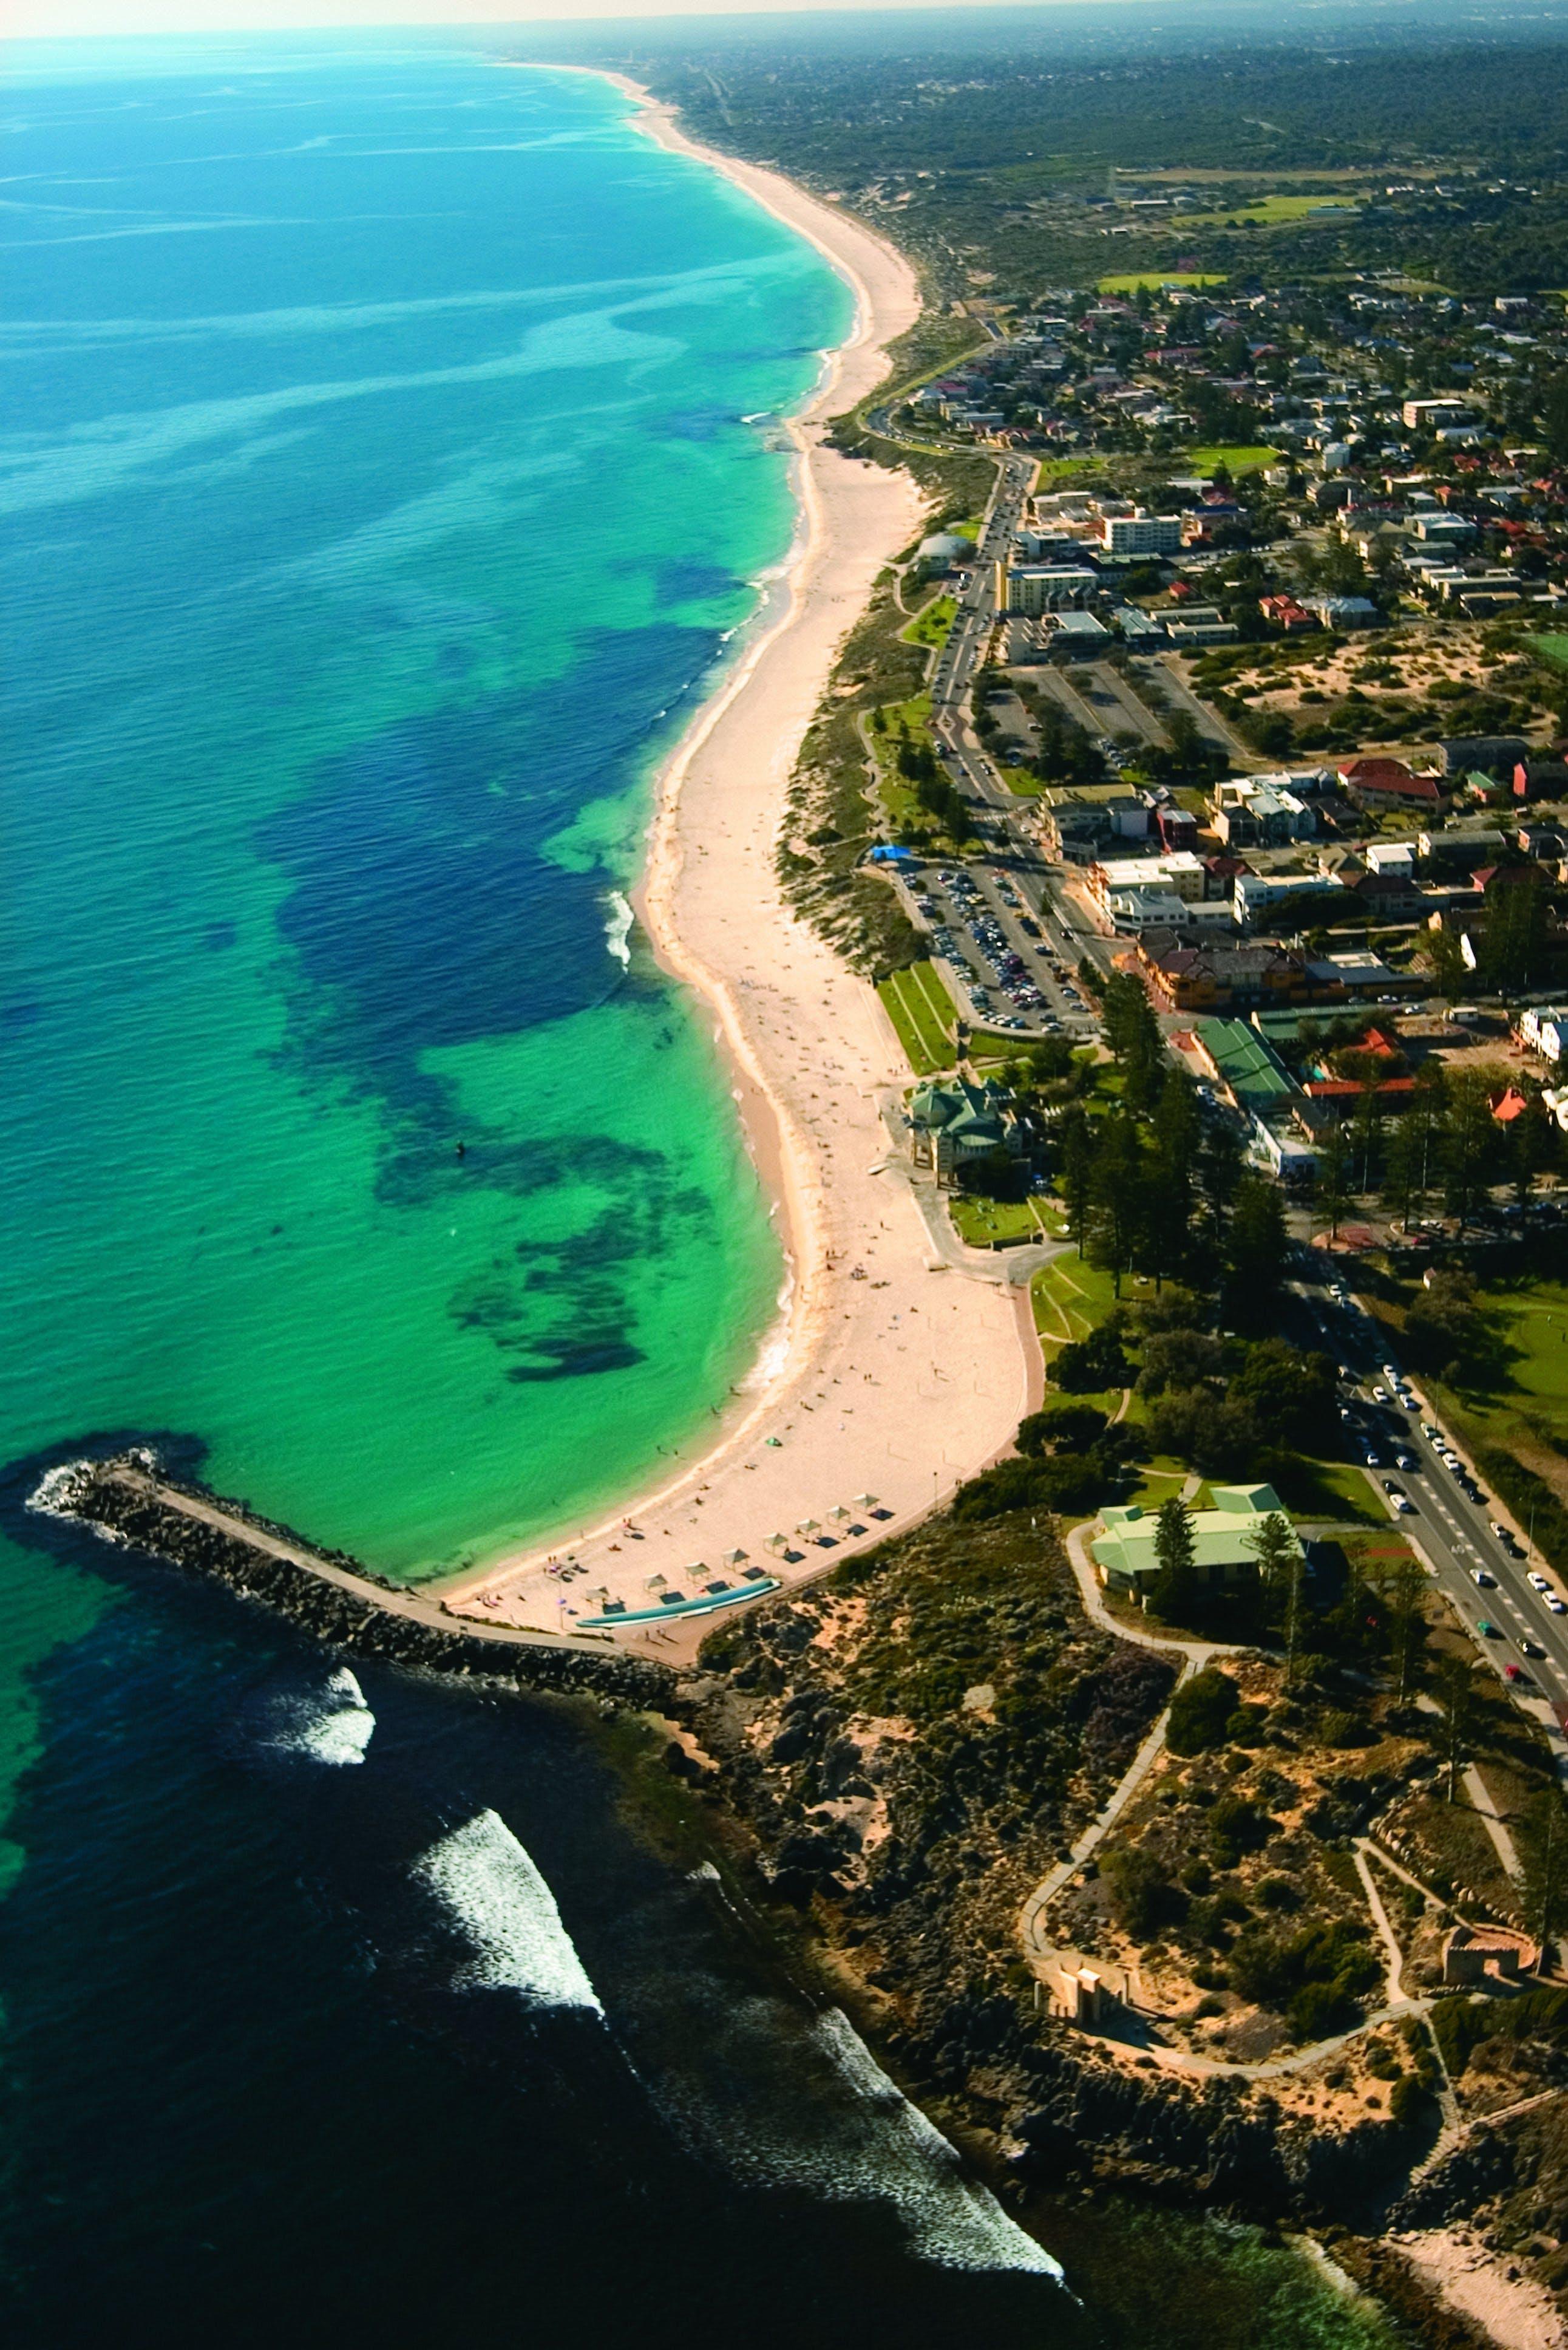 North Cottesloe Beach, Cottesloe, Western Australia